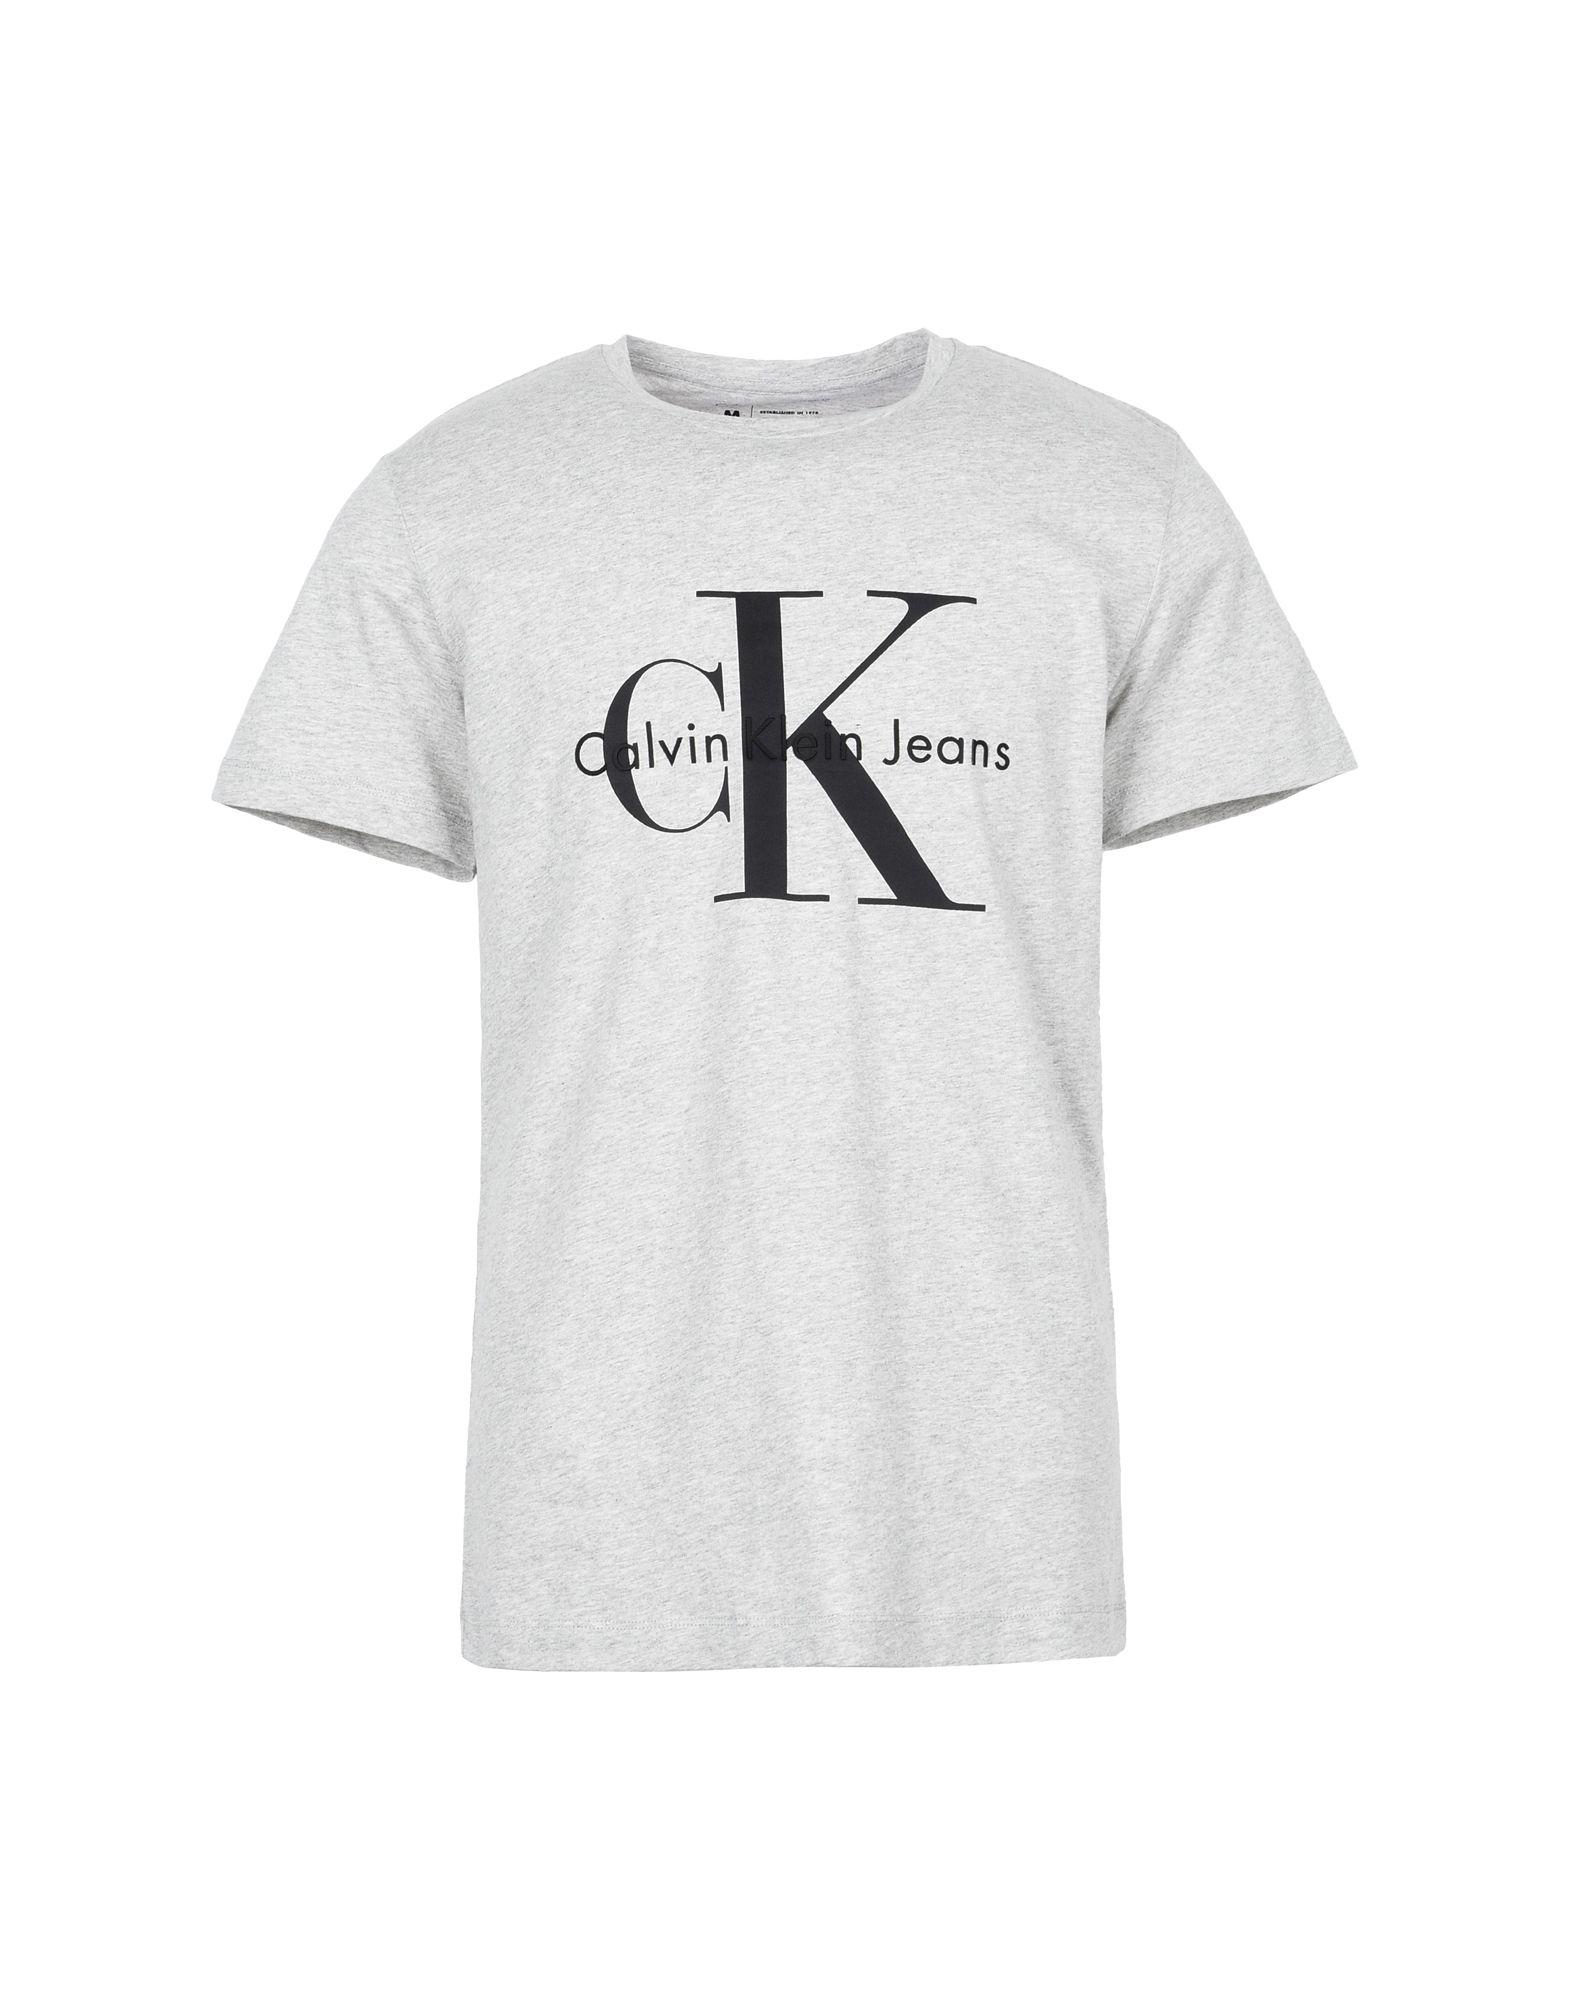 t-shirt vans uomo calvin klain